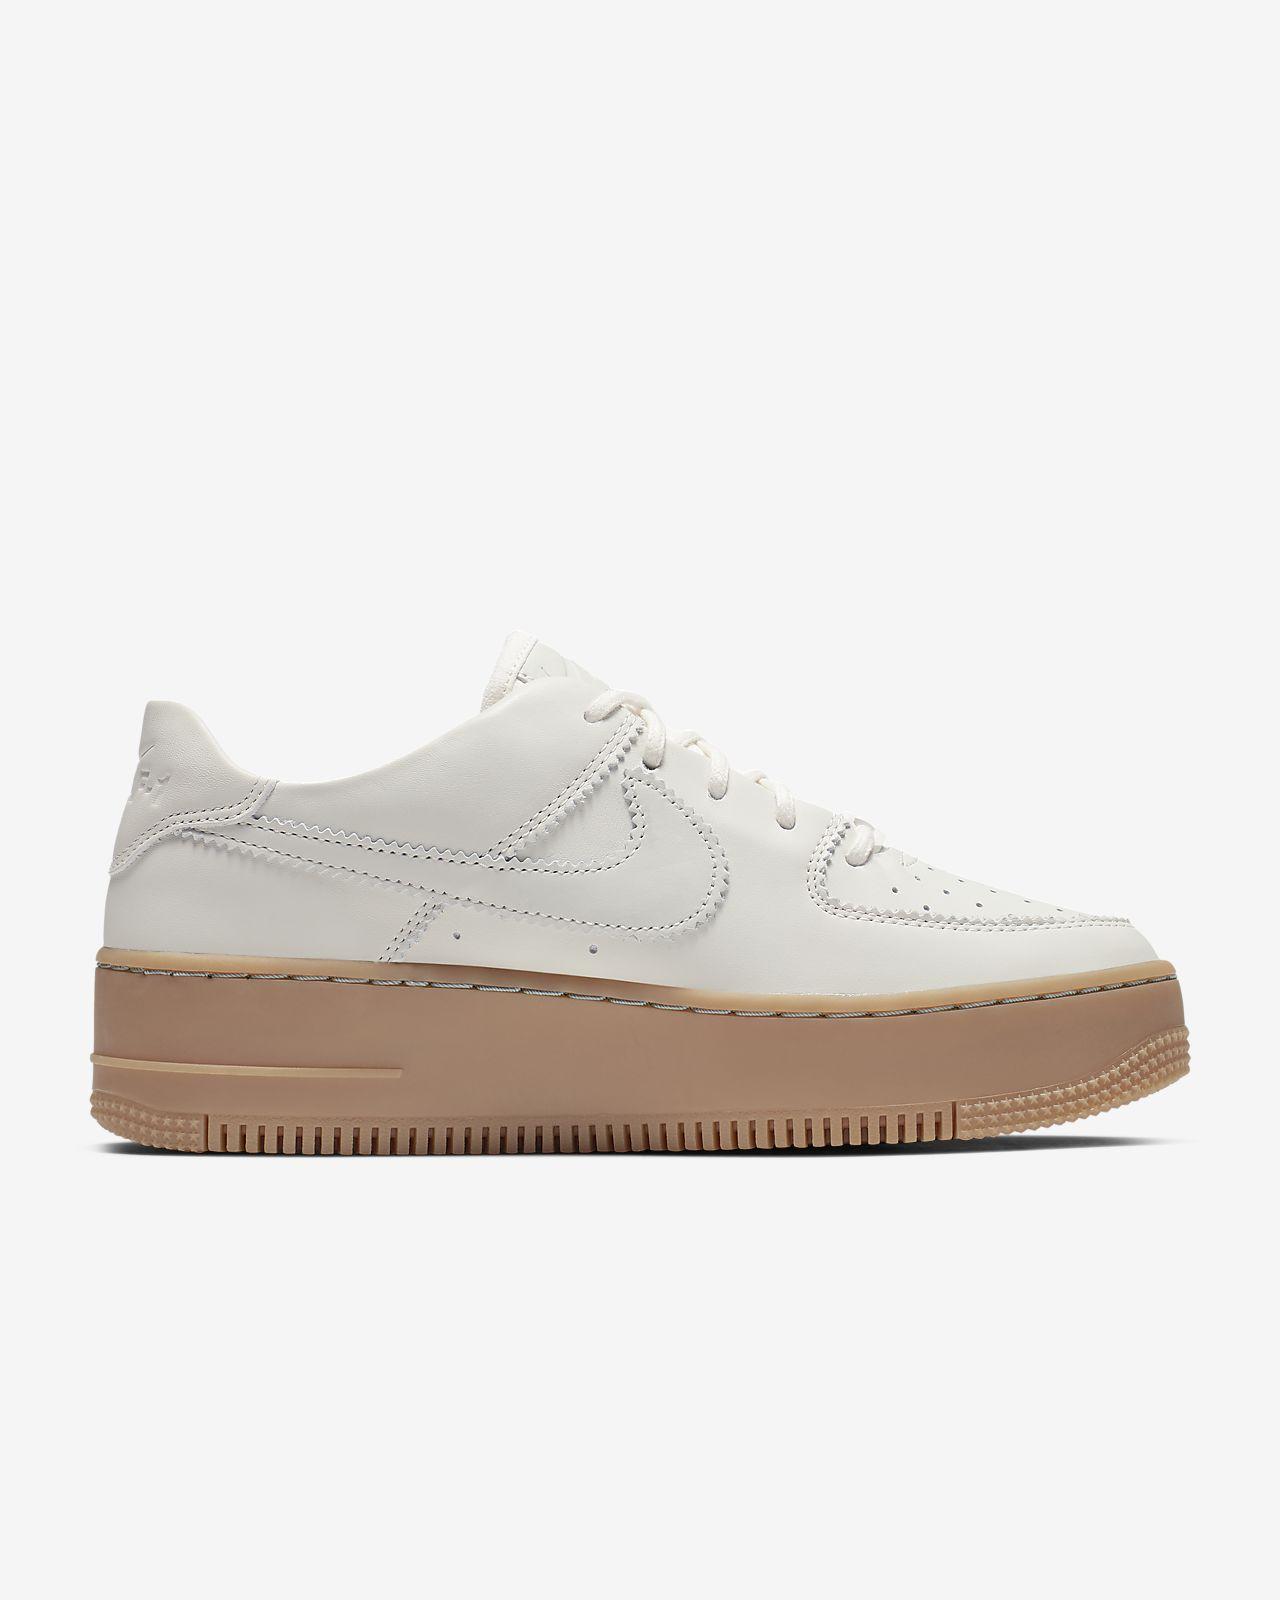 quality design 2446e 70e24 ... Chaussure Nike Air Force 1 Sage Low LX pour Femme